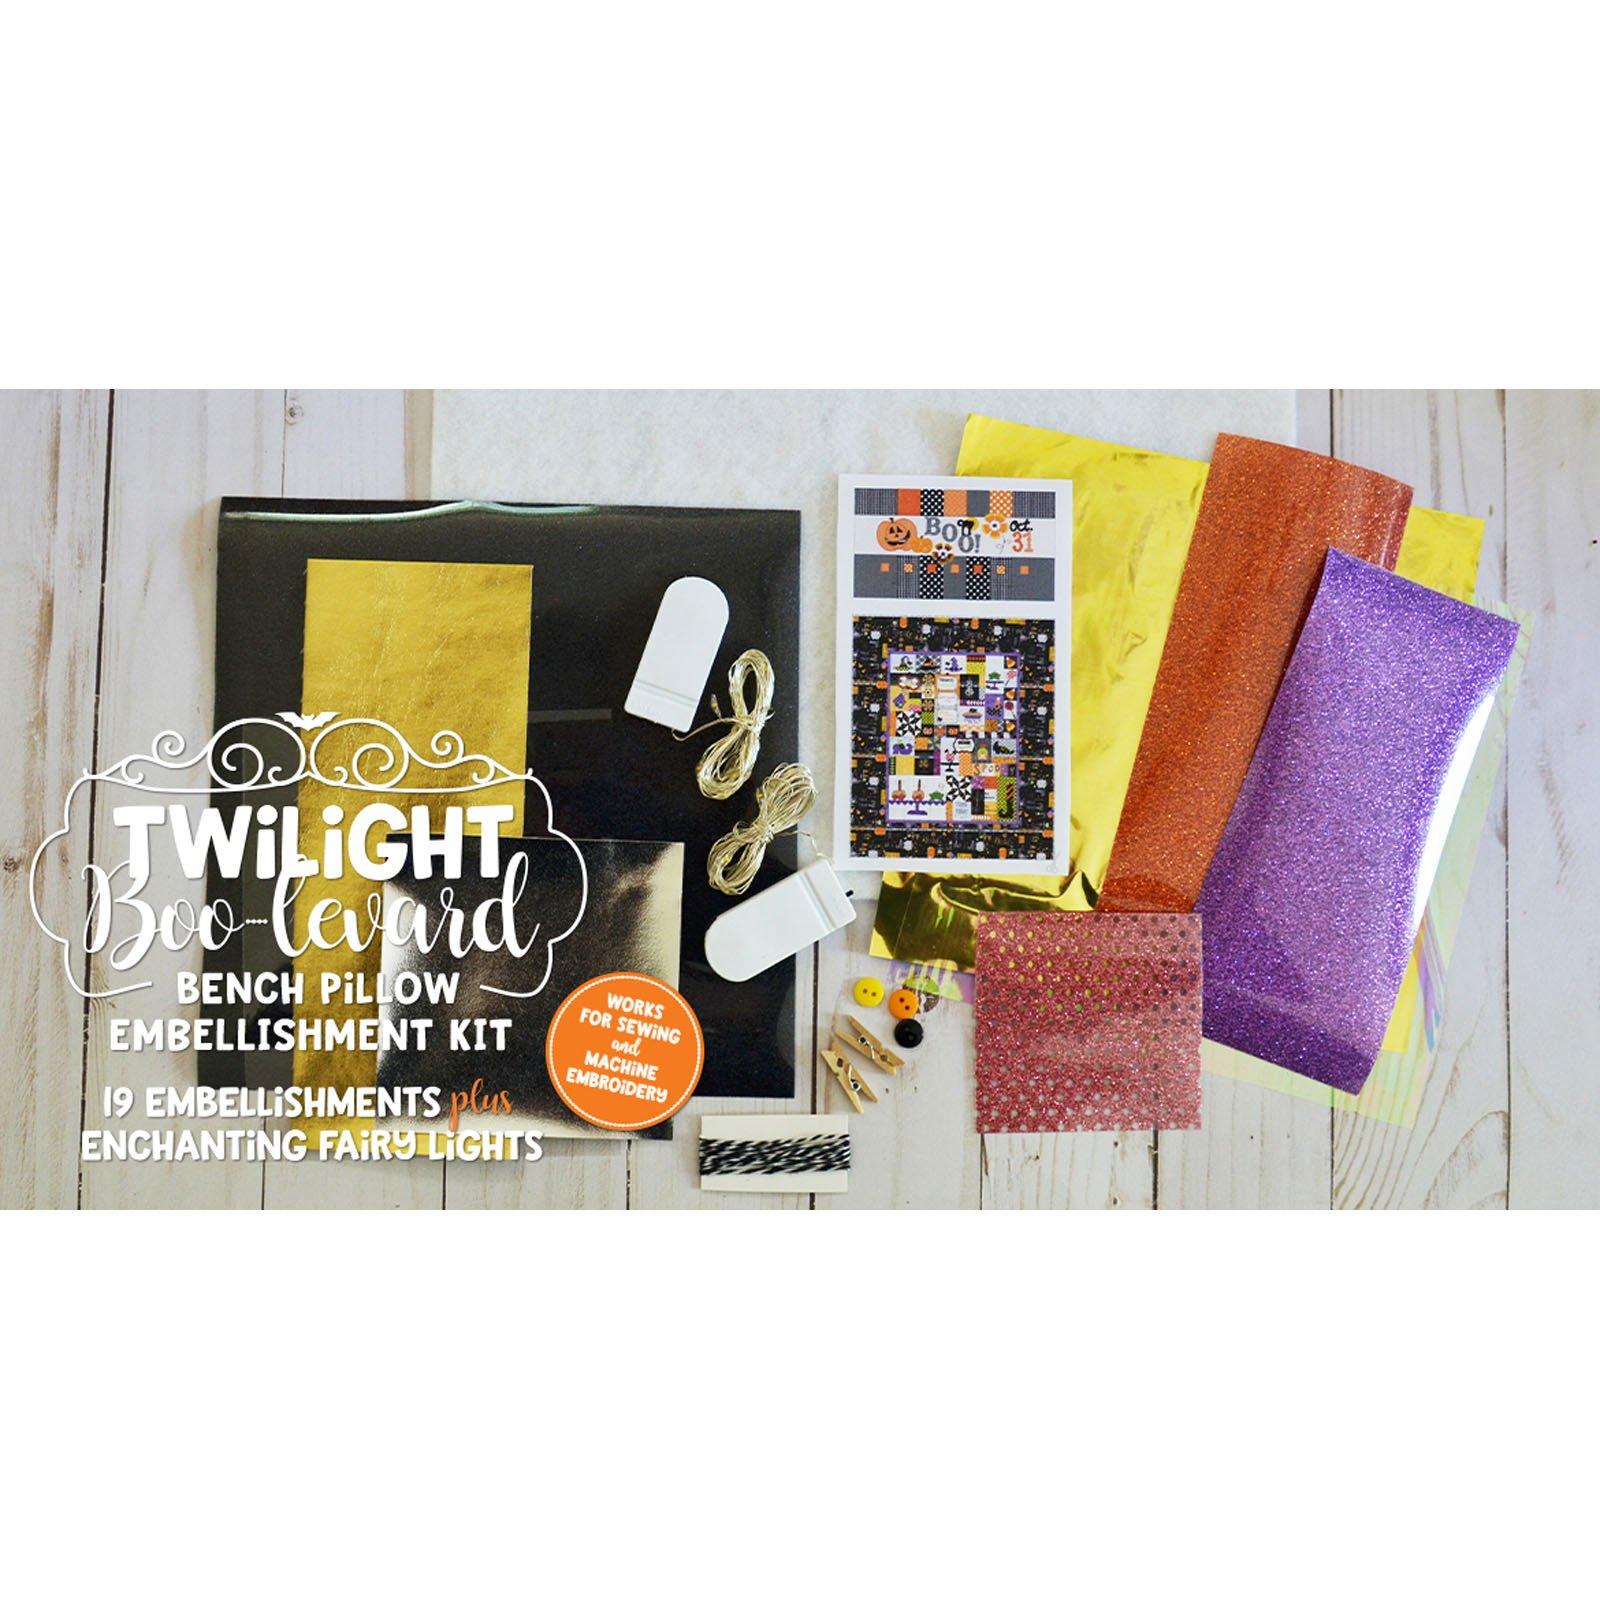 Twilight Boo-levard Embellishment Kit by Kimberbell